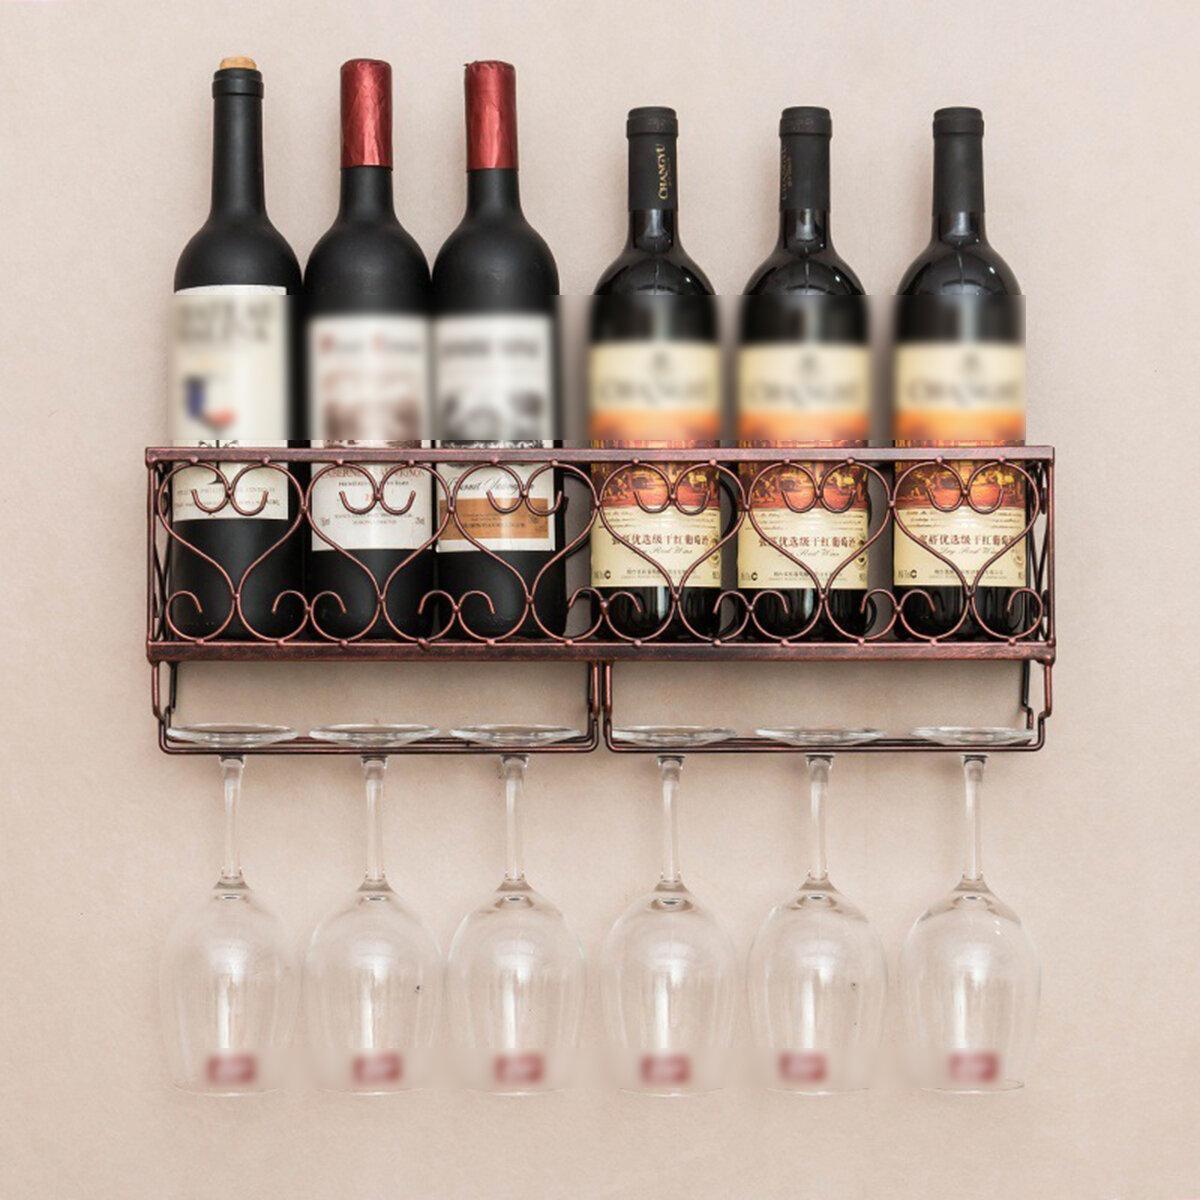 SHANGRONG D59838 Wall Mount Liquor Rack Metal Storage Shelf Glass Holder Hanging Home Kitchen Bar